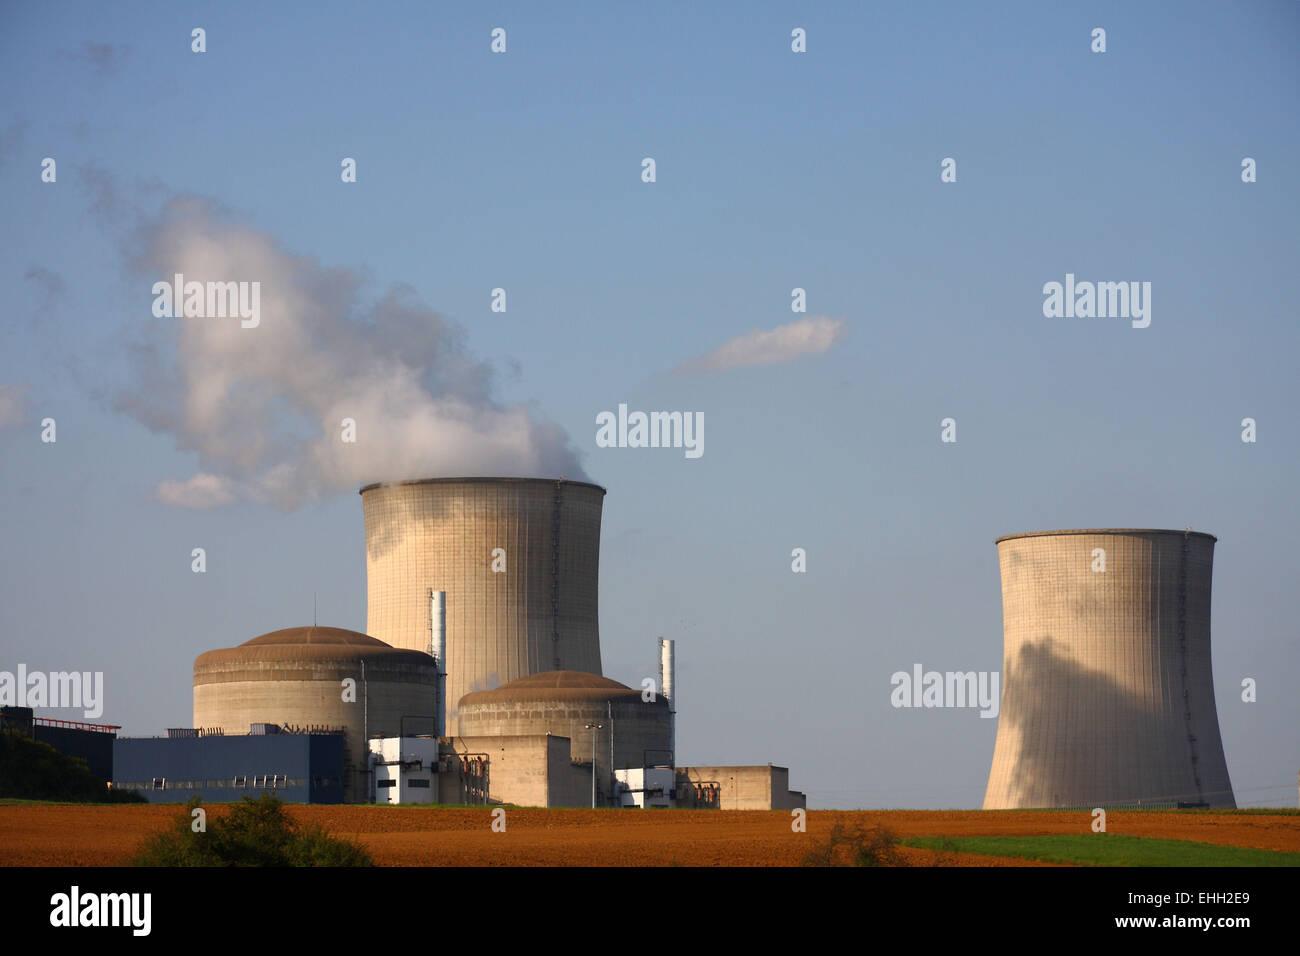 Atomic power plant Cattenom - Stock Image